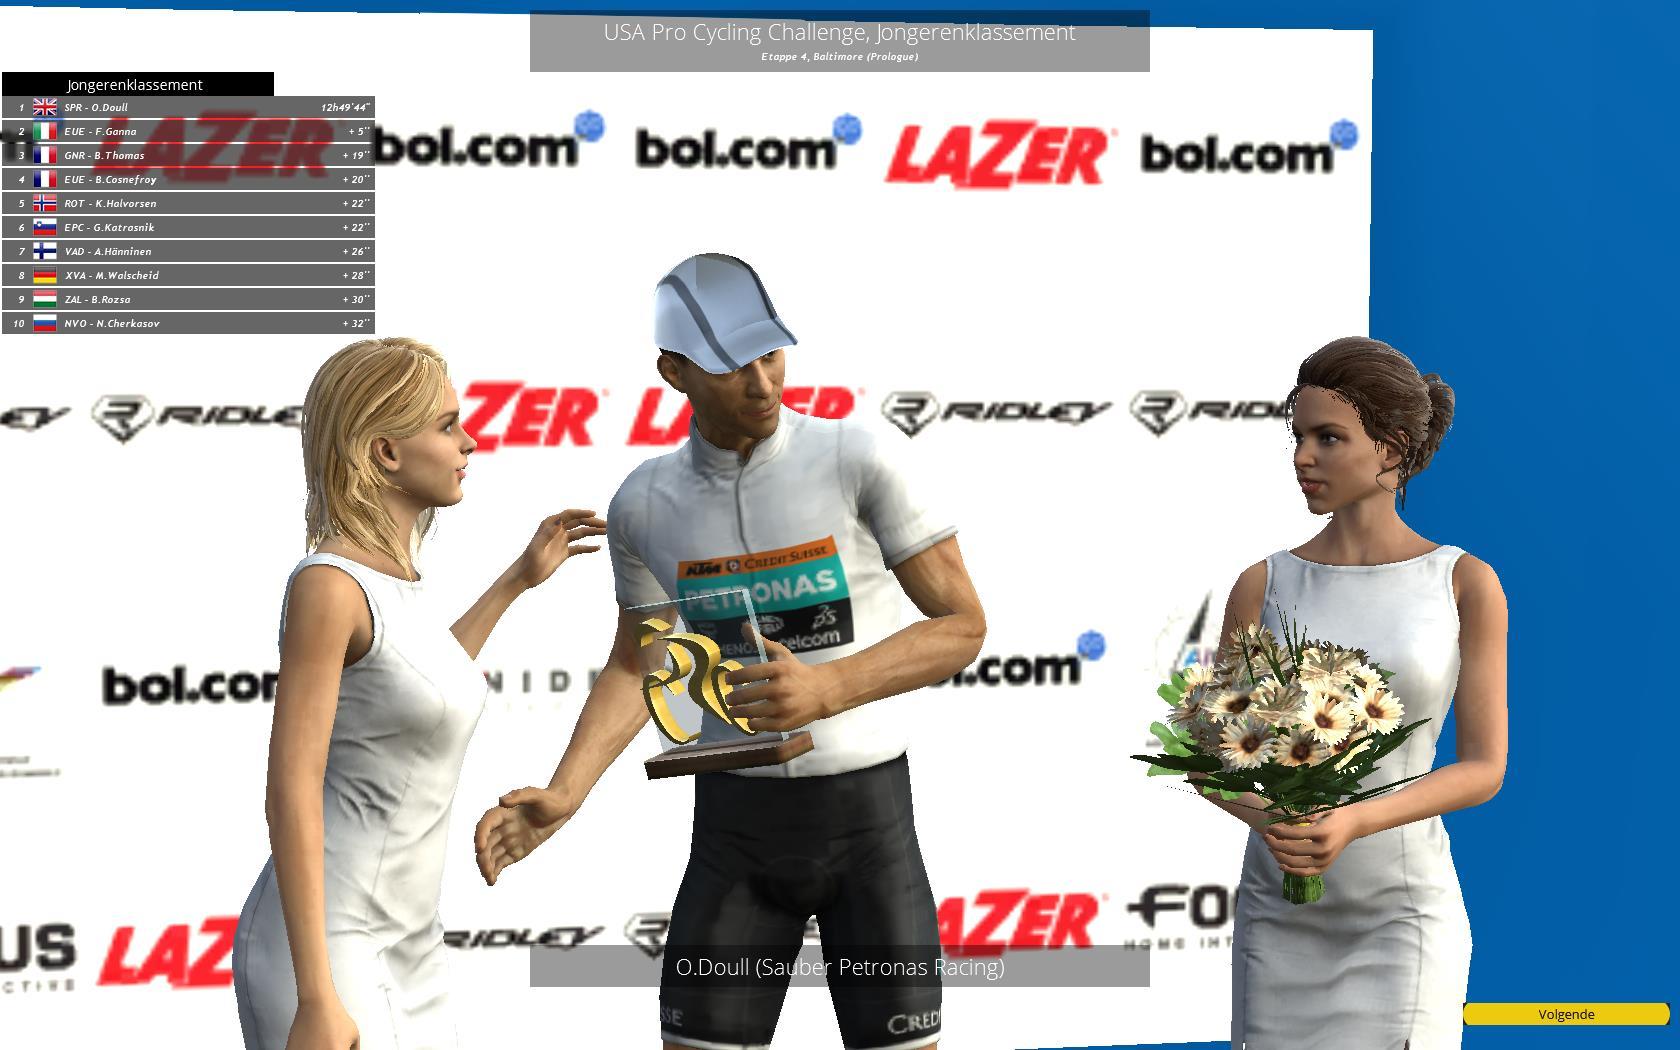 pcmdaily.com/images/mg/2018/Races/C2/USAPCC/4/PCM0045.jpg